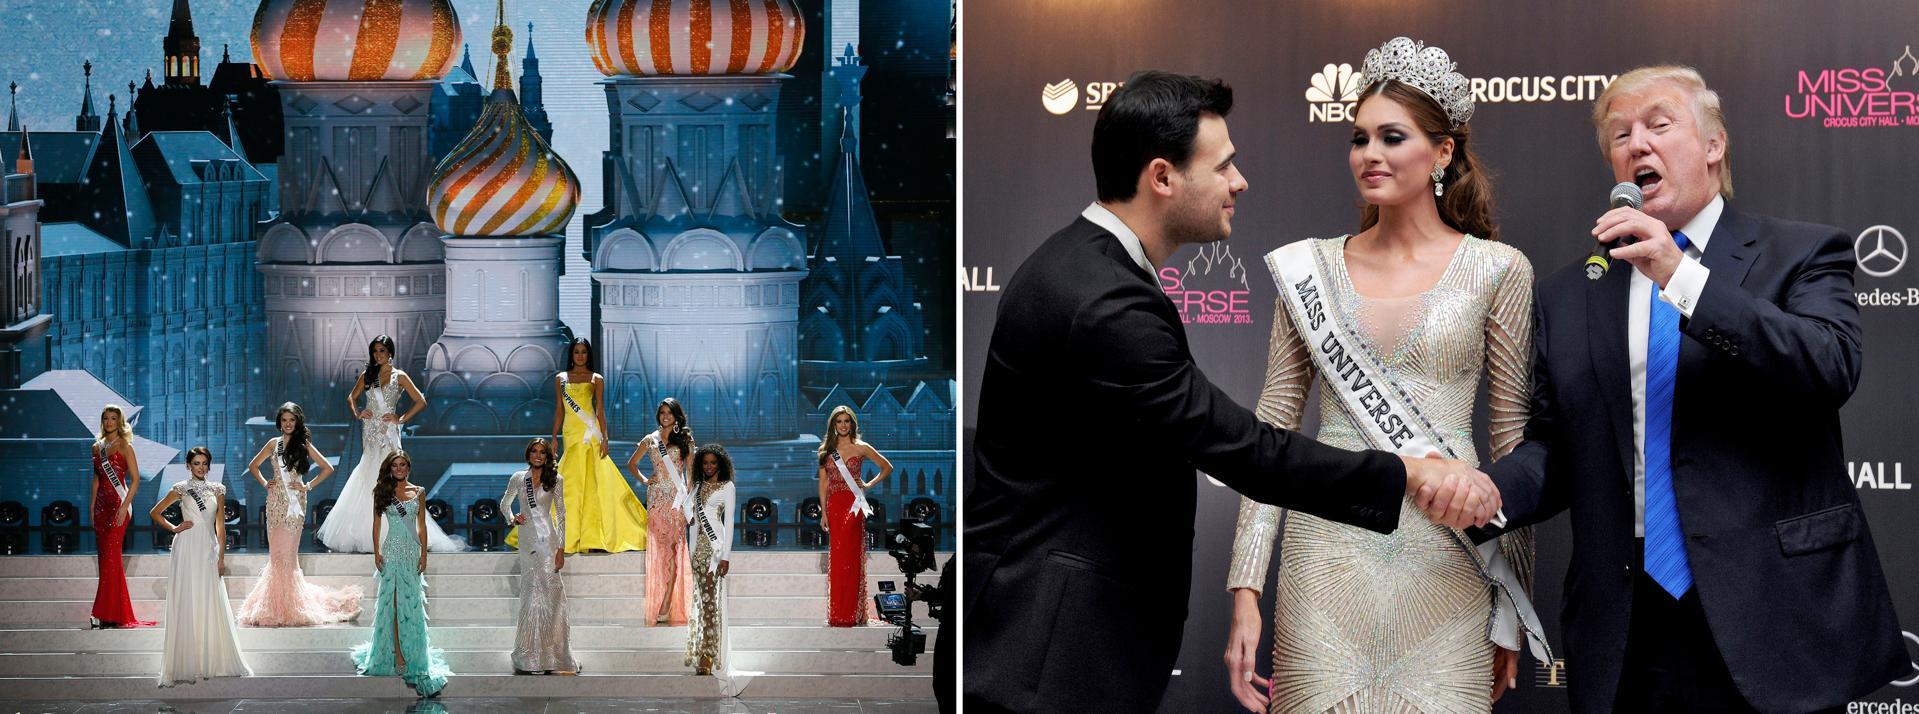 Miss Universe Miss Venezuela Donald Trump